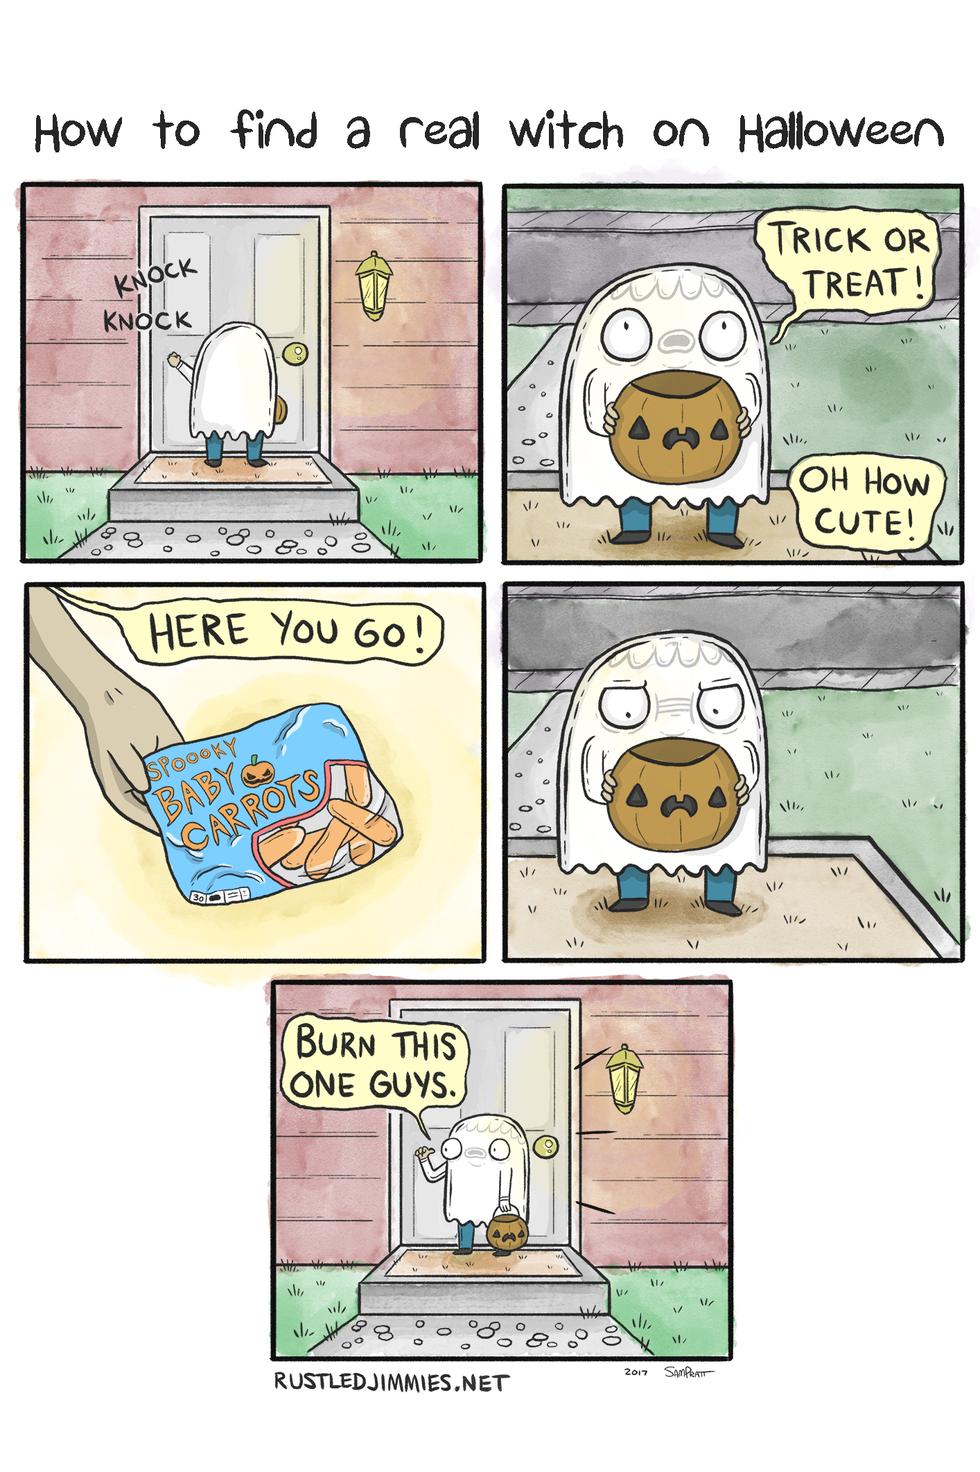 20 Funny Halloween Memes Only True Halloween Fans Will